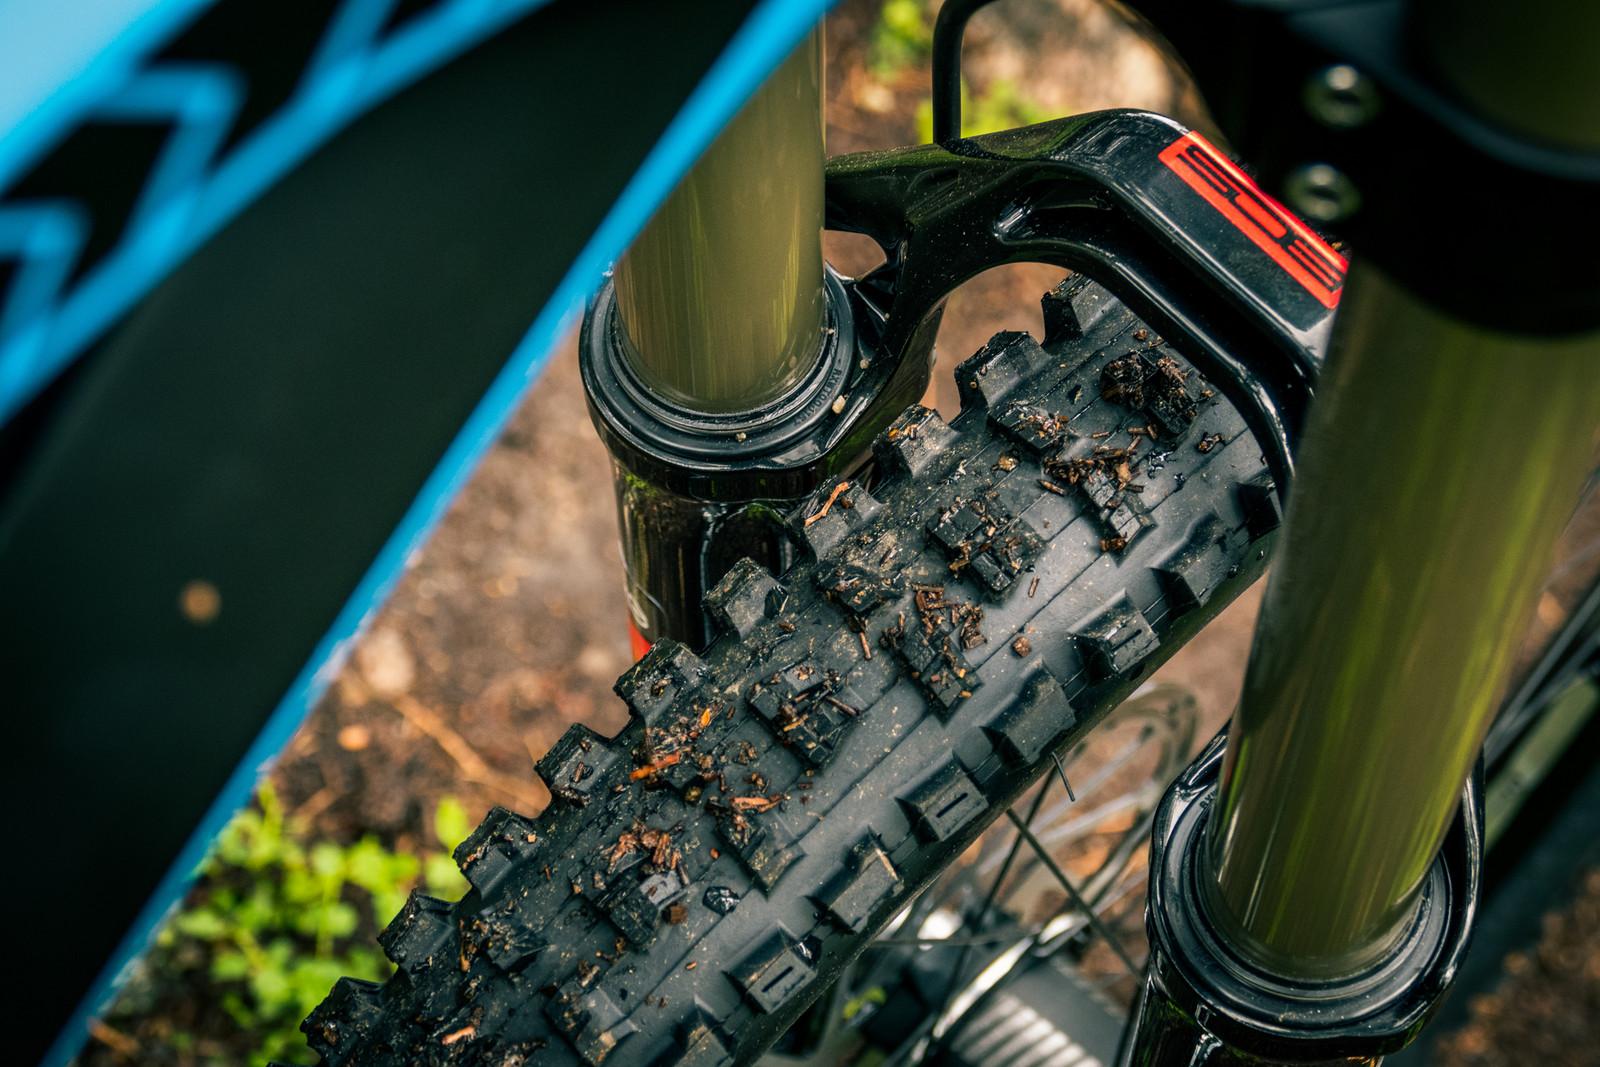 2015 YT Tues CF Pro Downhill Bike - Testing the 2015 YT Tues CF Pro Downhill Bike - Mountain Biking Pictures - Vital MTB